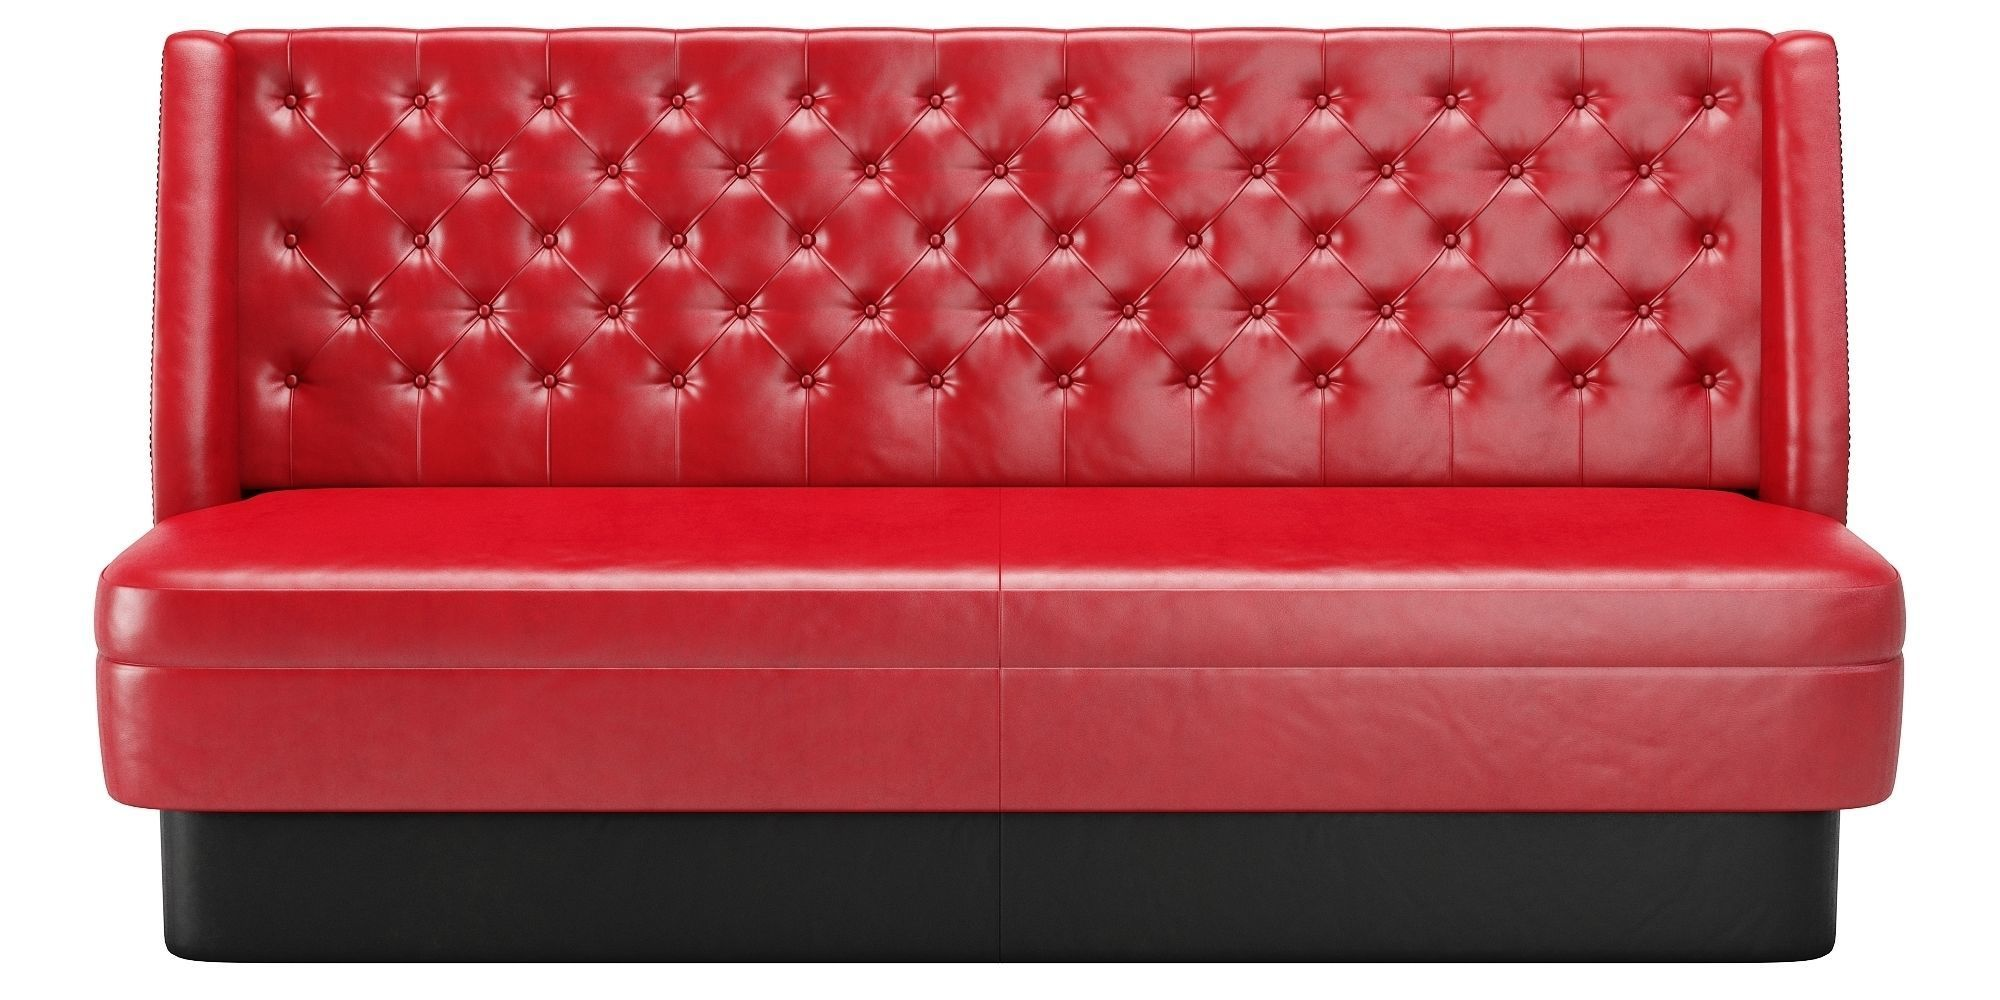 Toposworkshop Jazz Sofa 3d Model Max Obj Fbx Unitypackage 1 ...